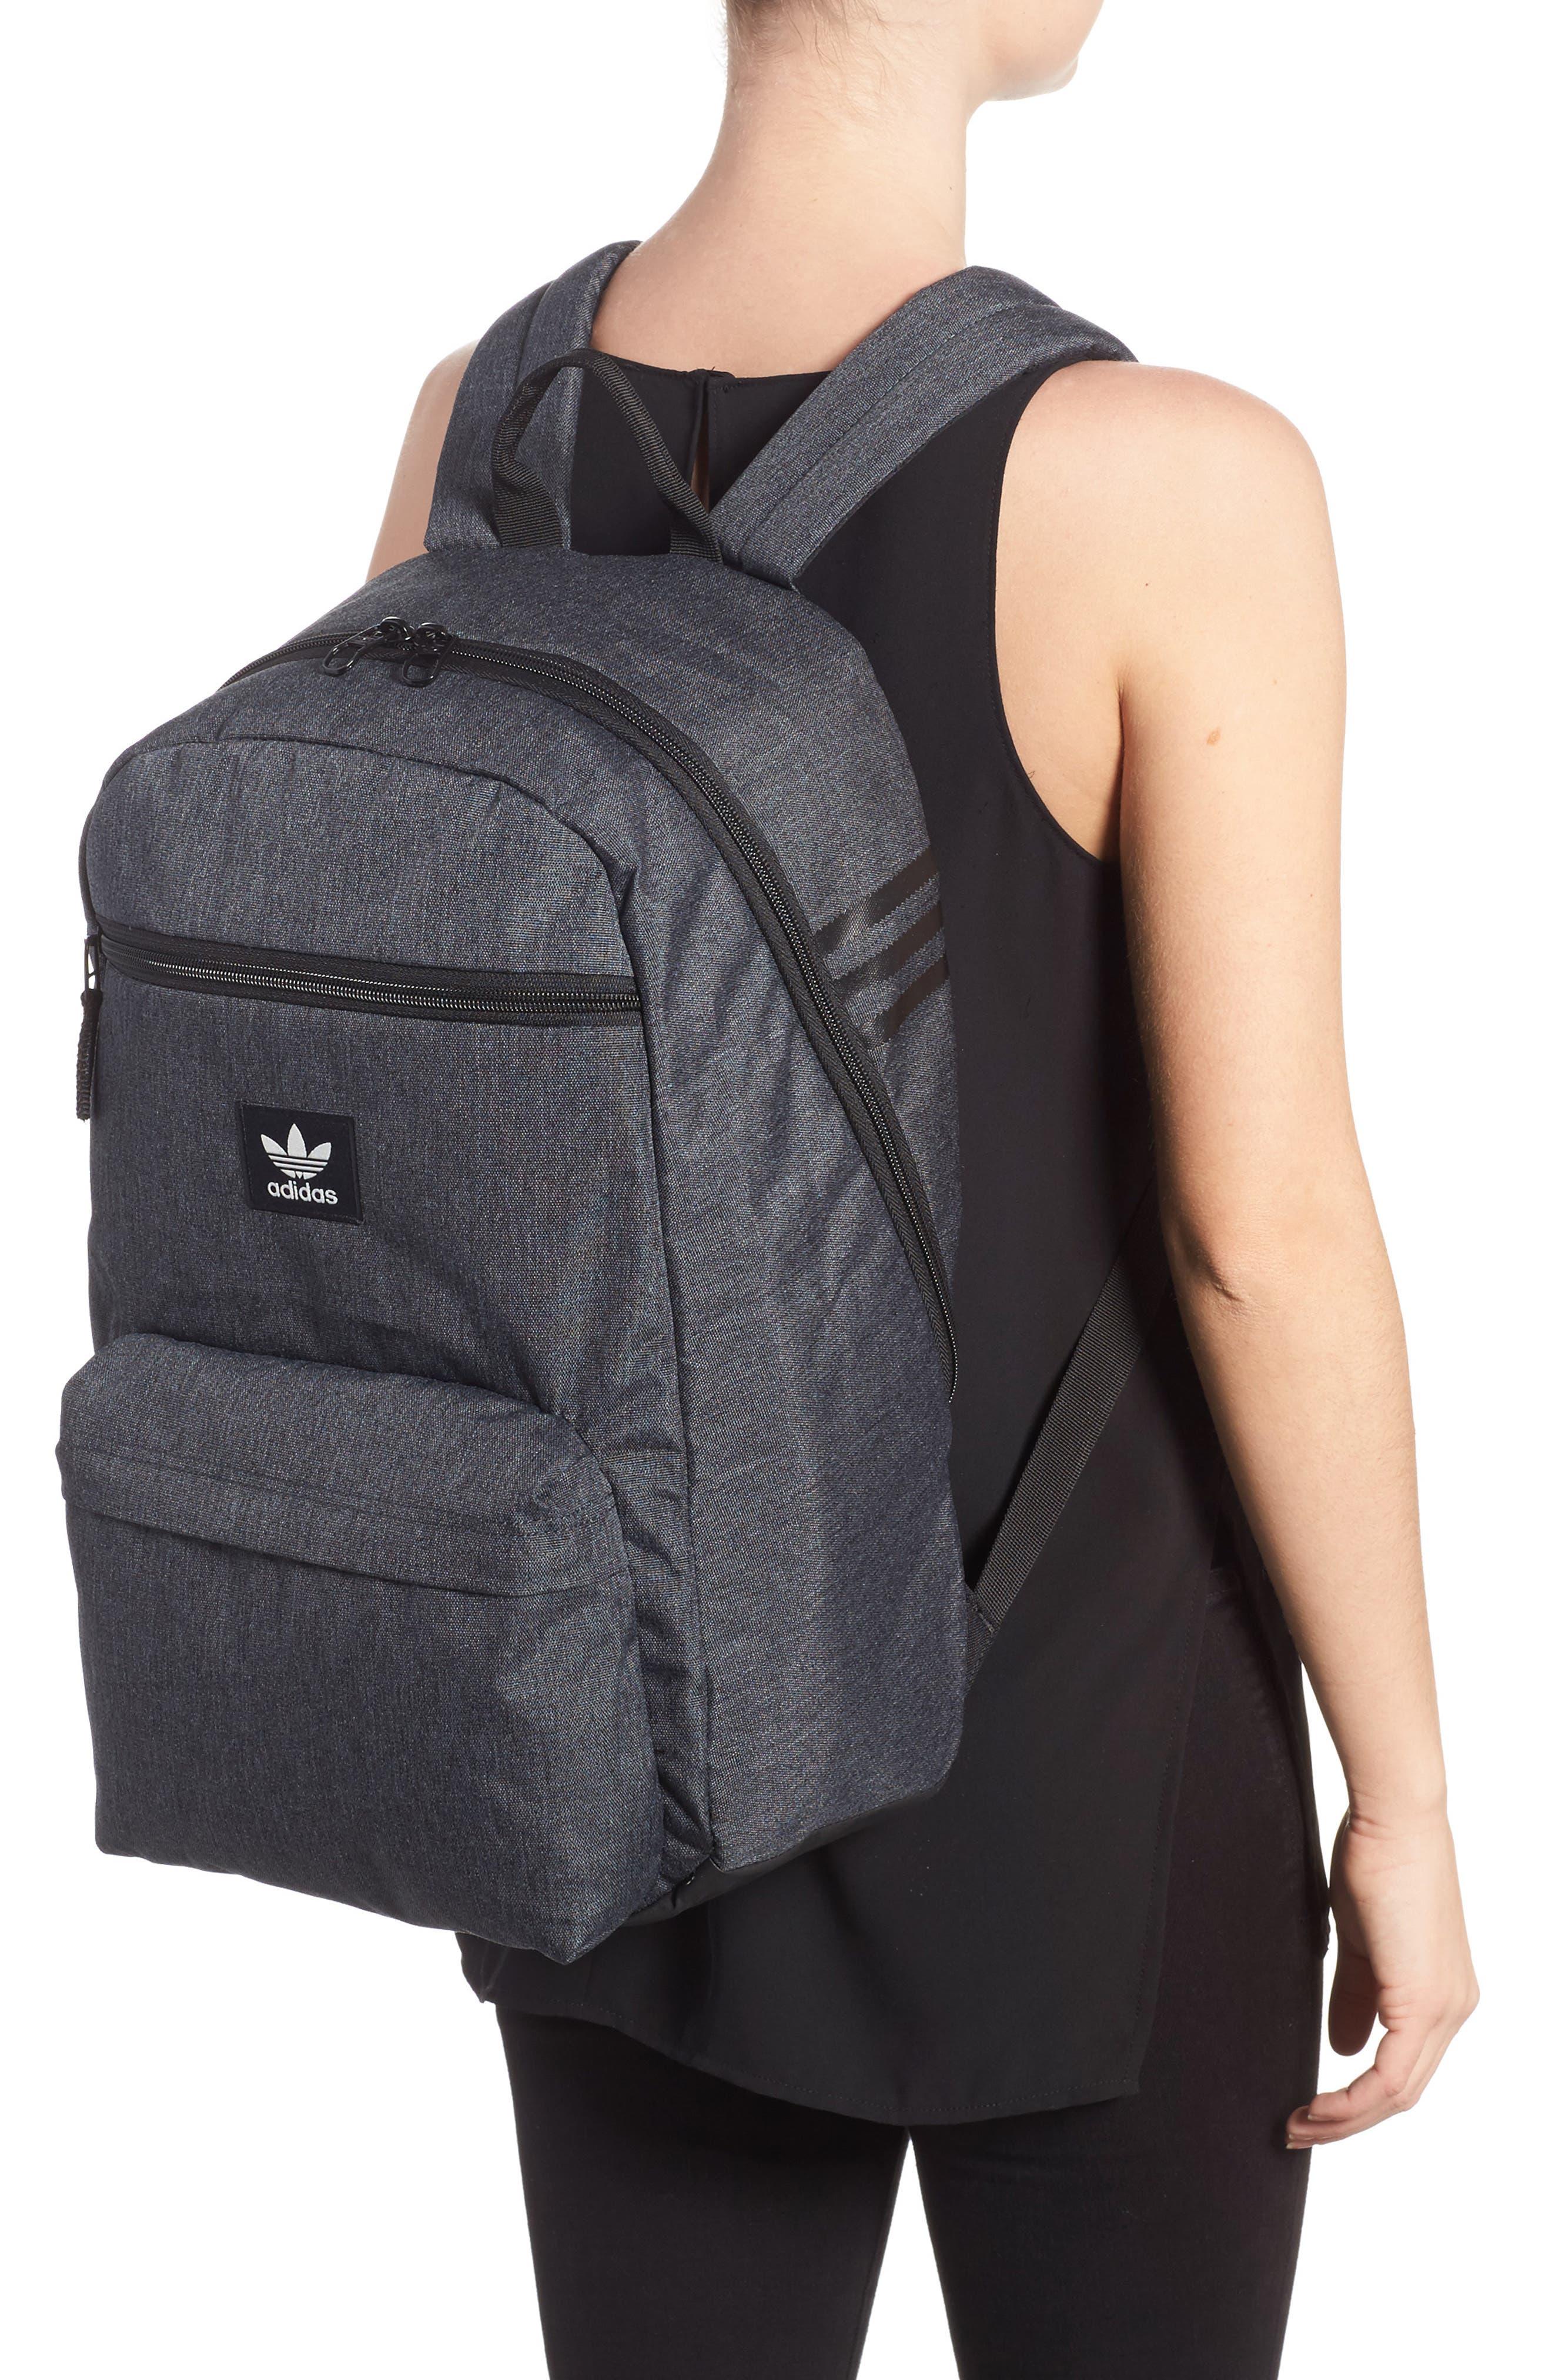 National Plus Backpack,                             Alternate thumbnail 2, color,                             BLACK/ GREY HEATHER/ WHITE